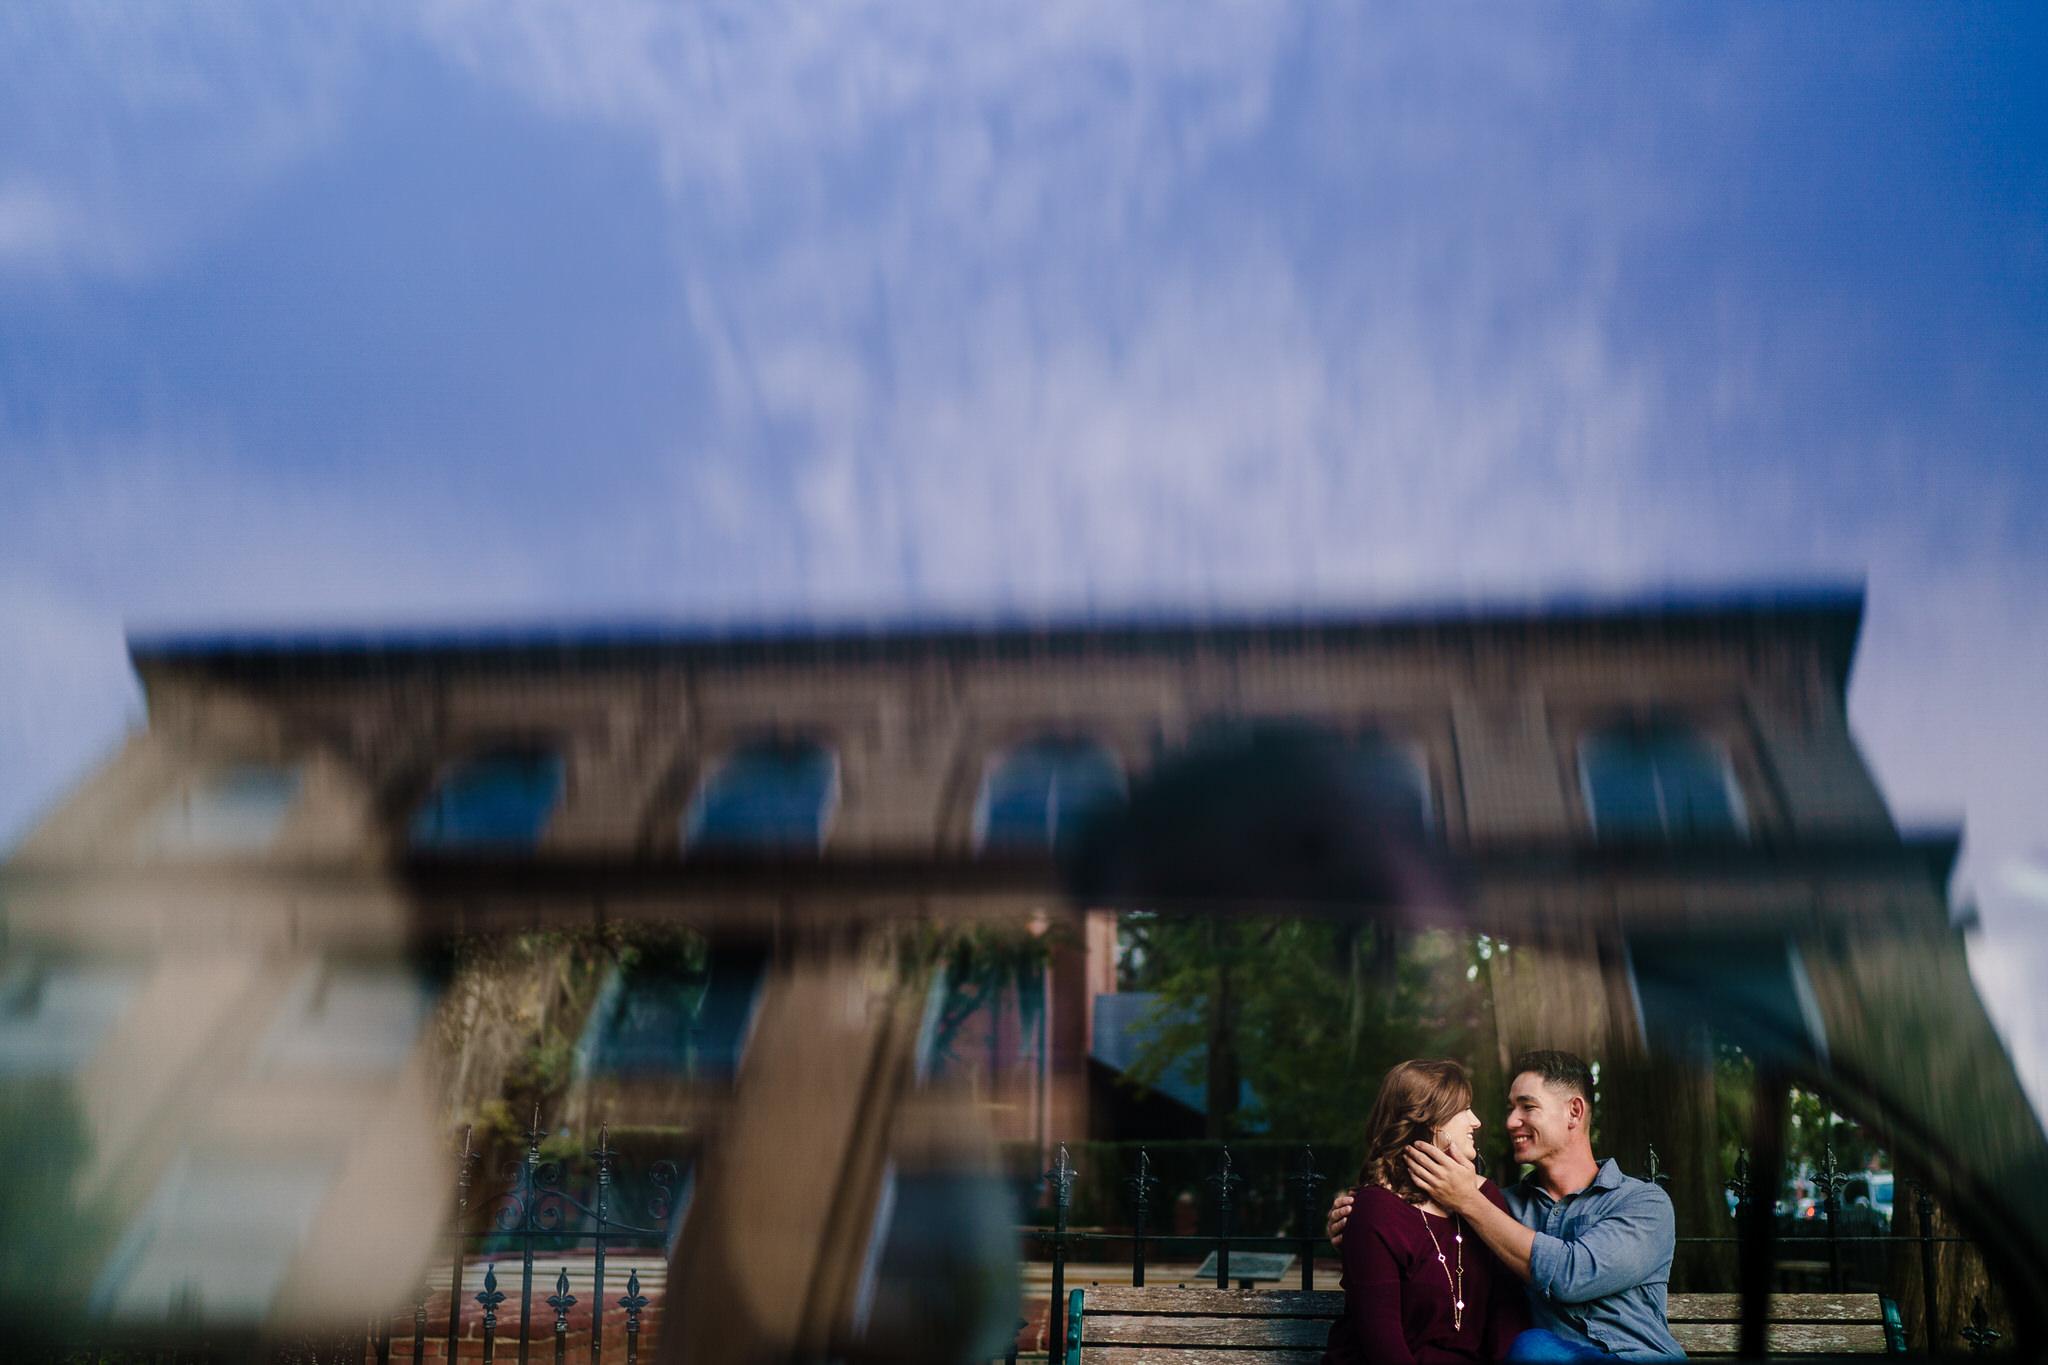 Shelby&Ye-New-Bern-Engagement-Photography-Chad-Winstead-005-1.jpg